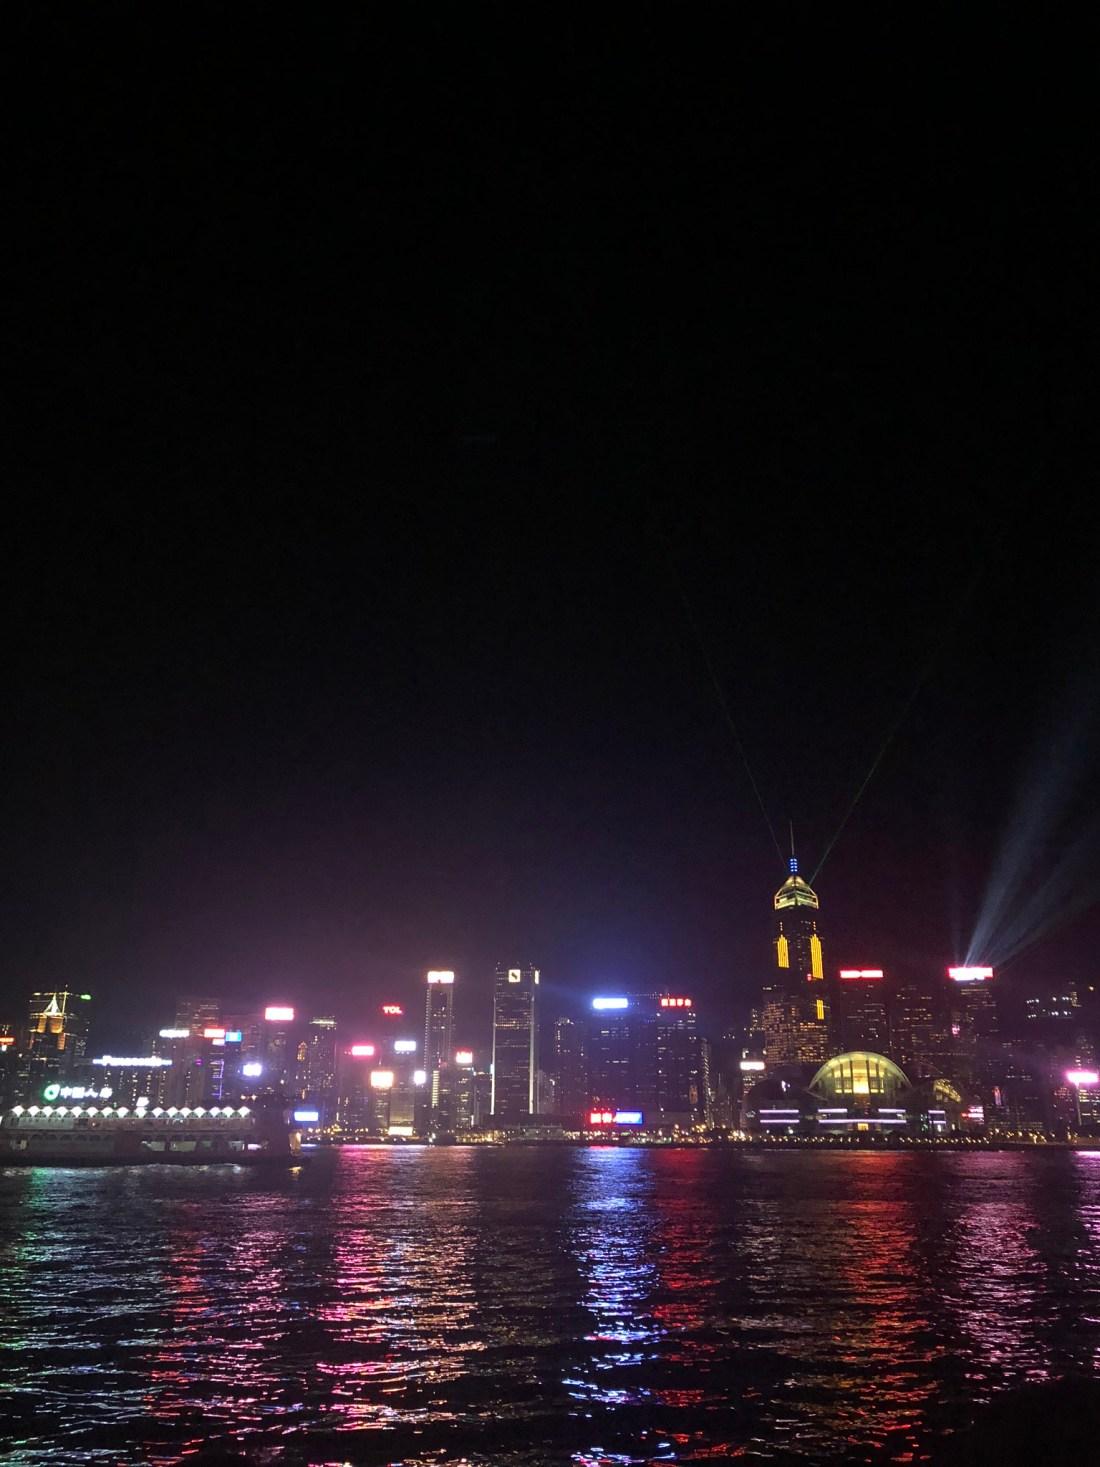 Lights across Victoria Harbour, Hong Kong